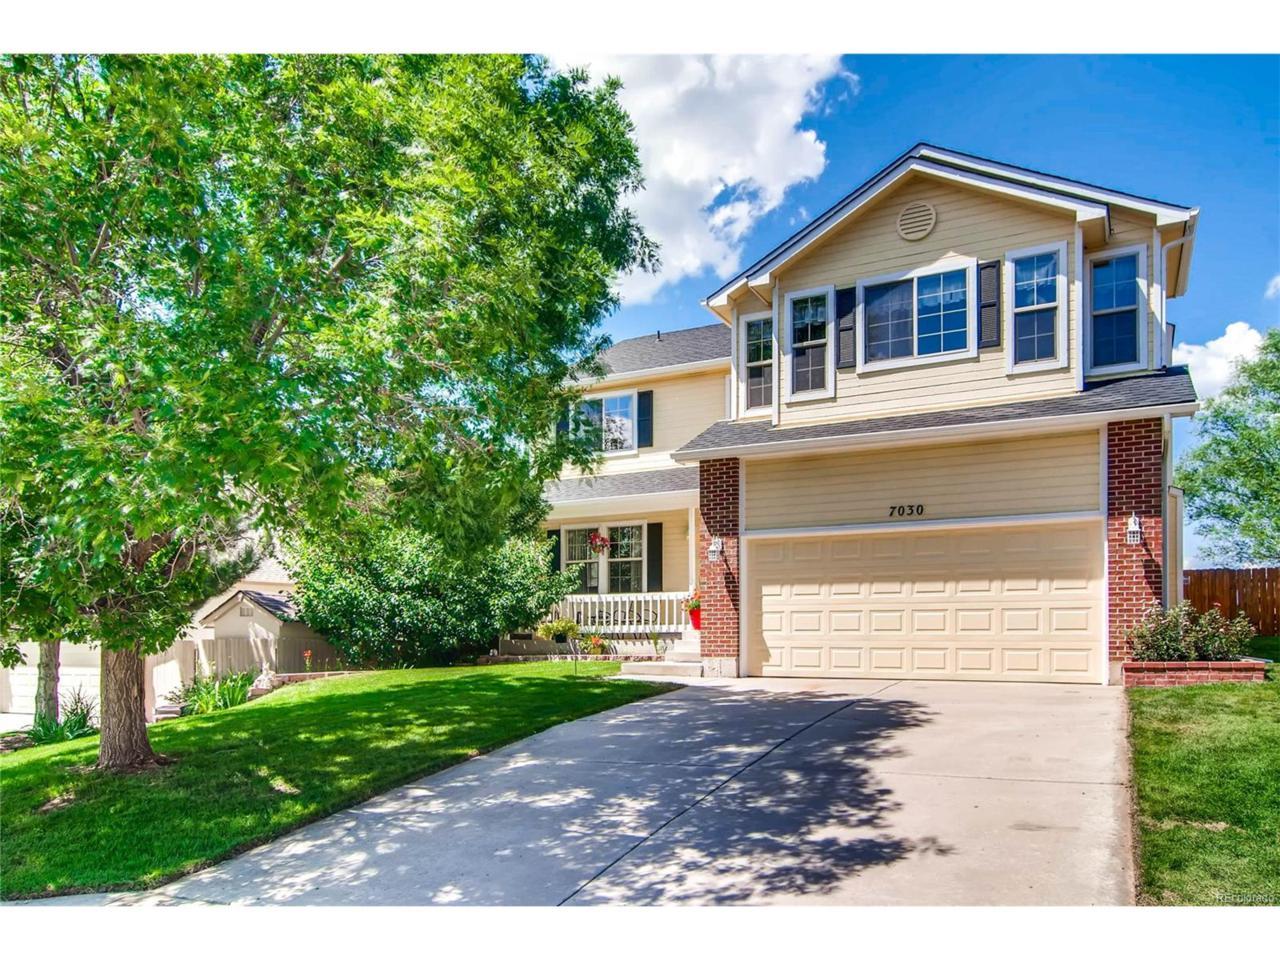 7030 Ashley Drive, Colorado Springs, CO 80922 (MLS #5906365) :: 8z Real Estate